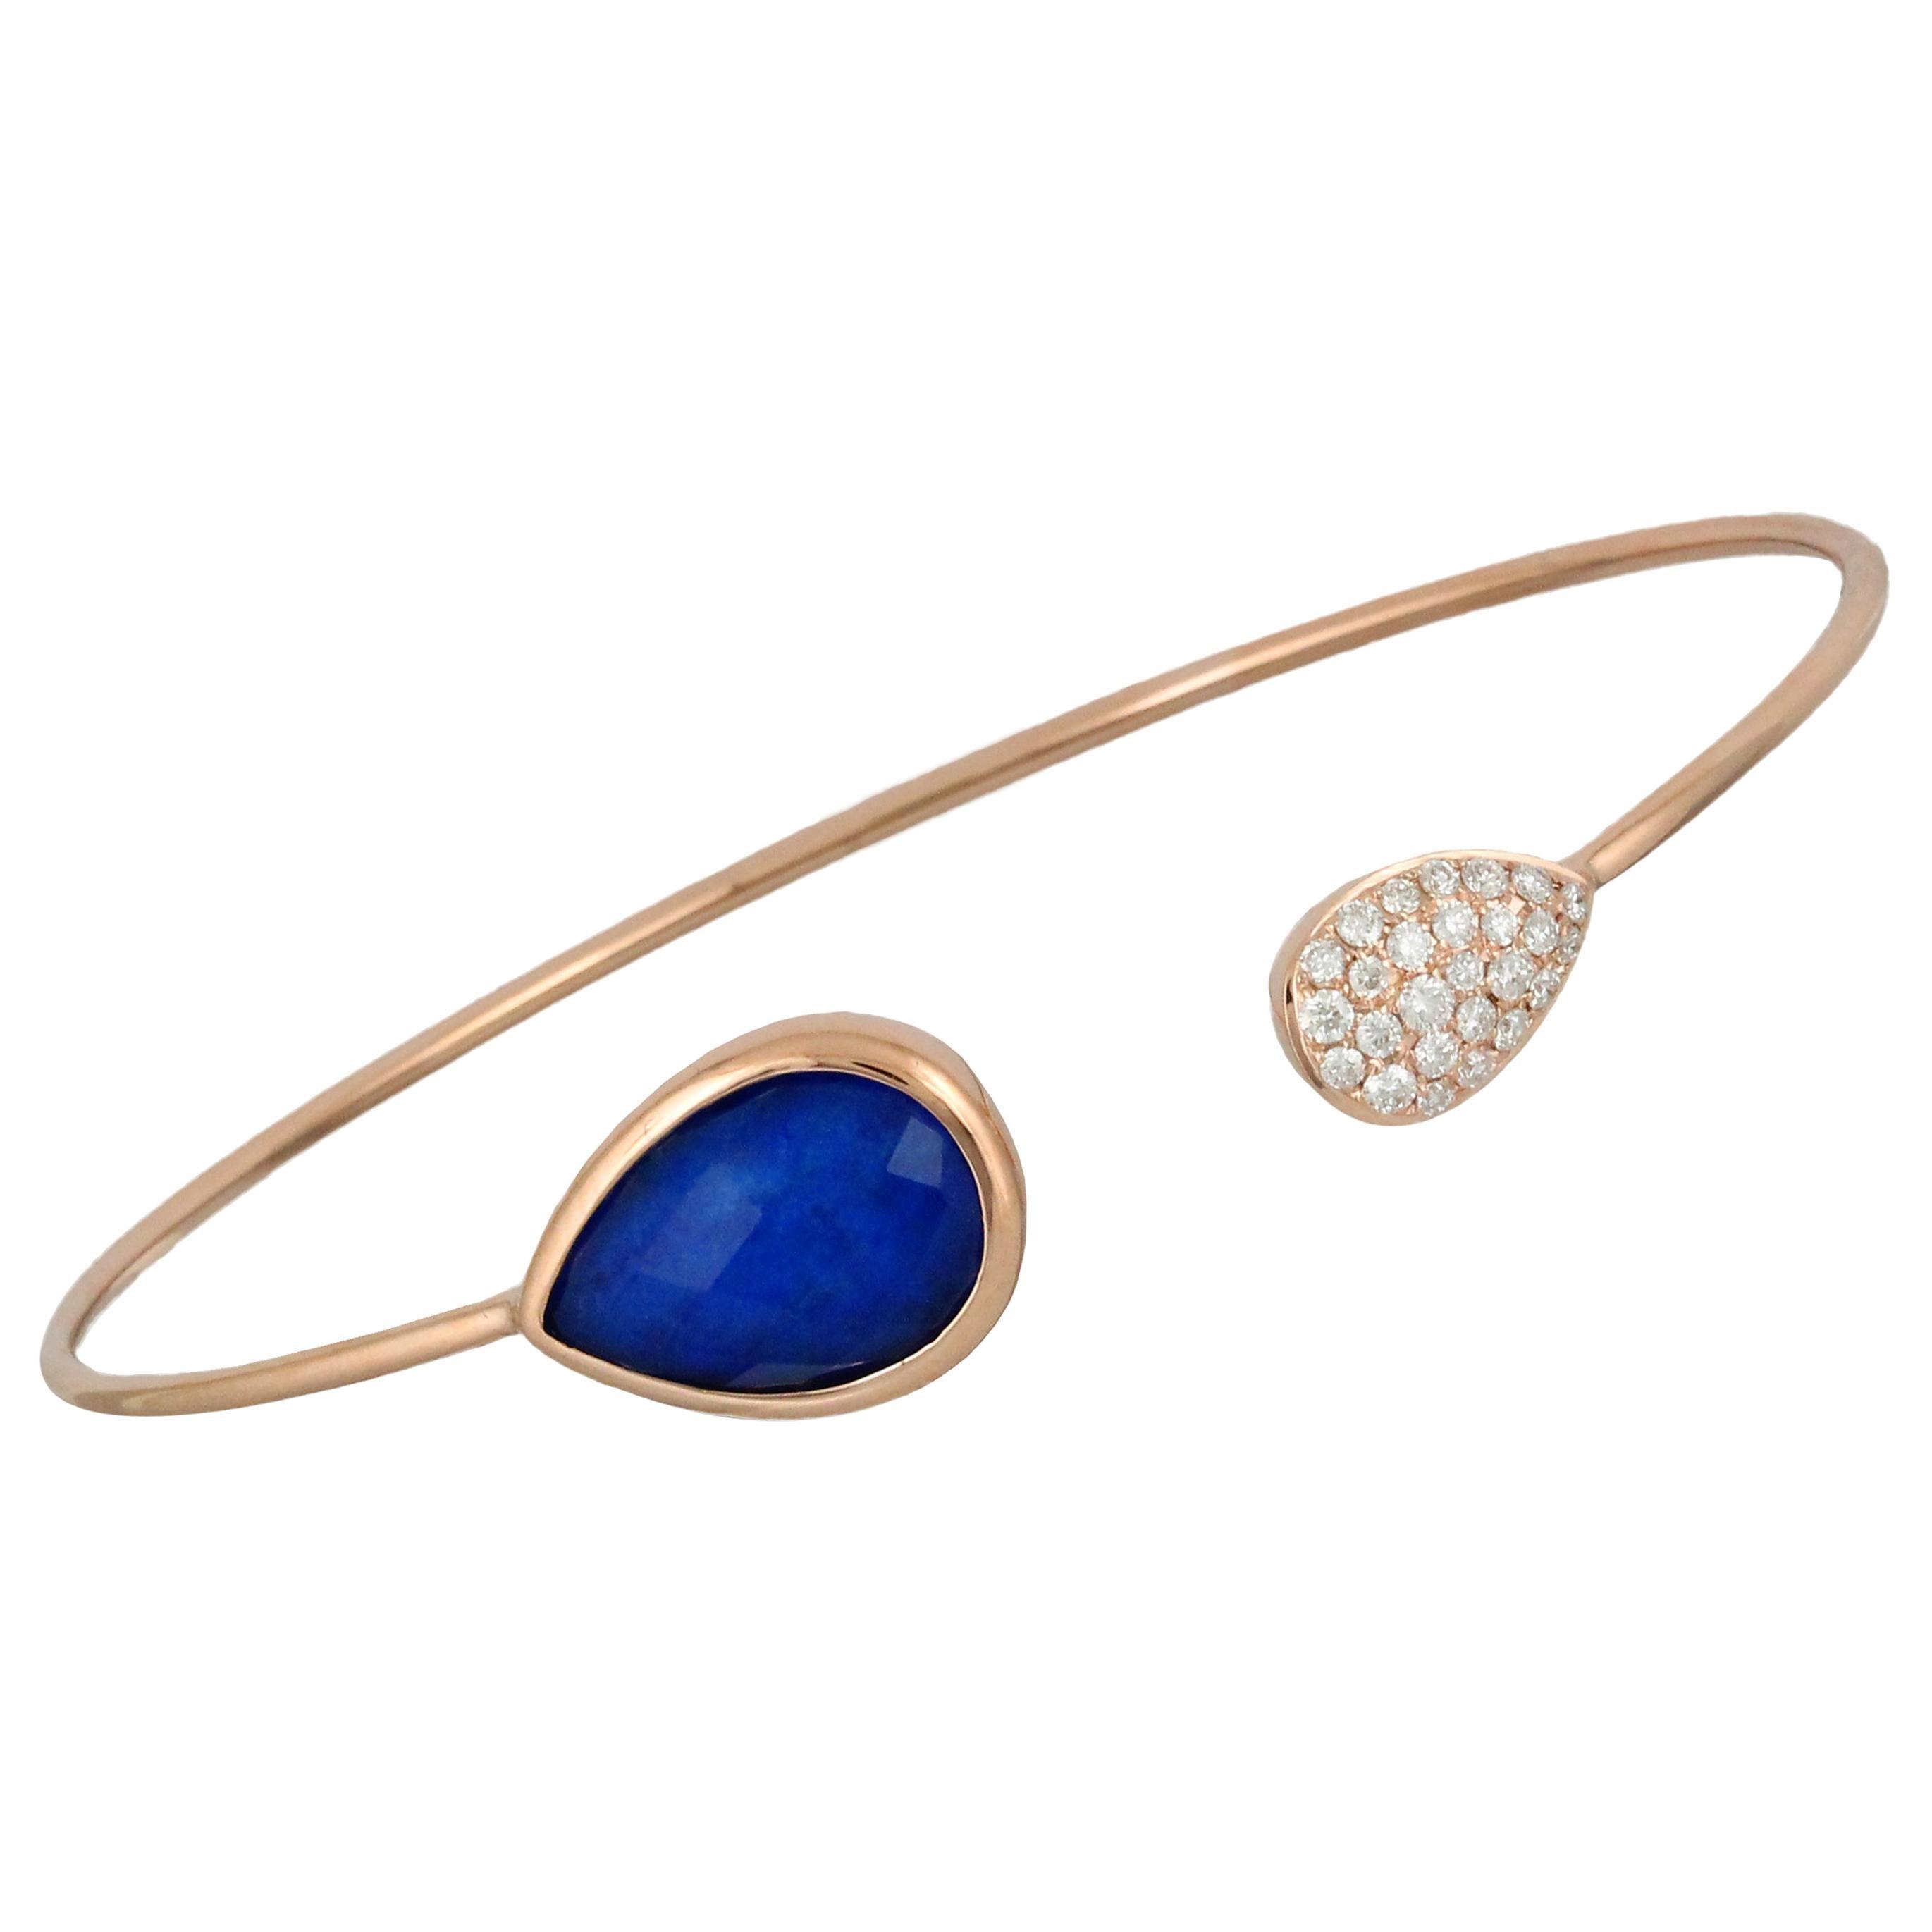 18K Rose Gold Flexible Bangle Bracelet w/ Lapis Lazuli, White Quartz & Diamonds